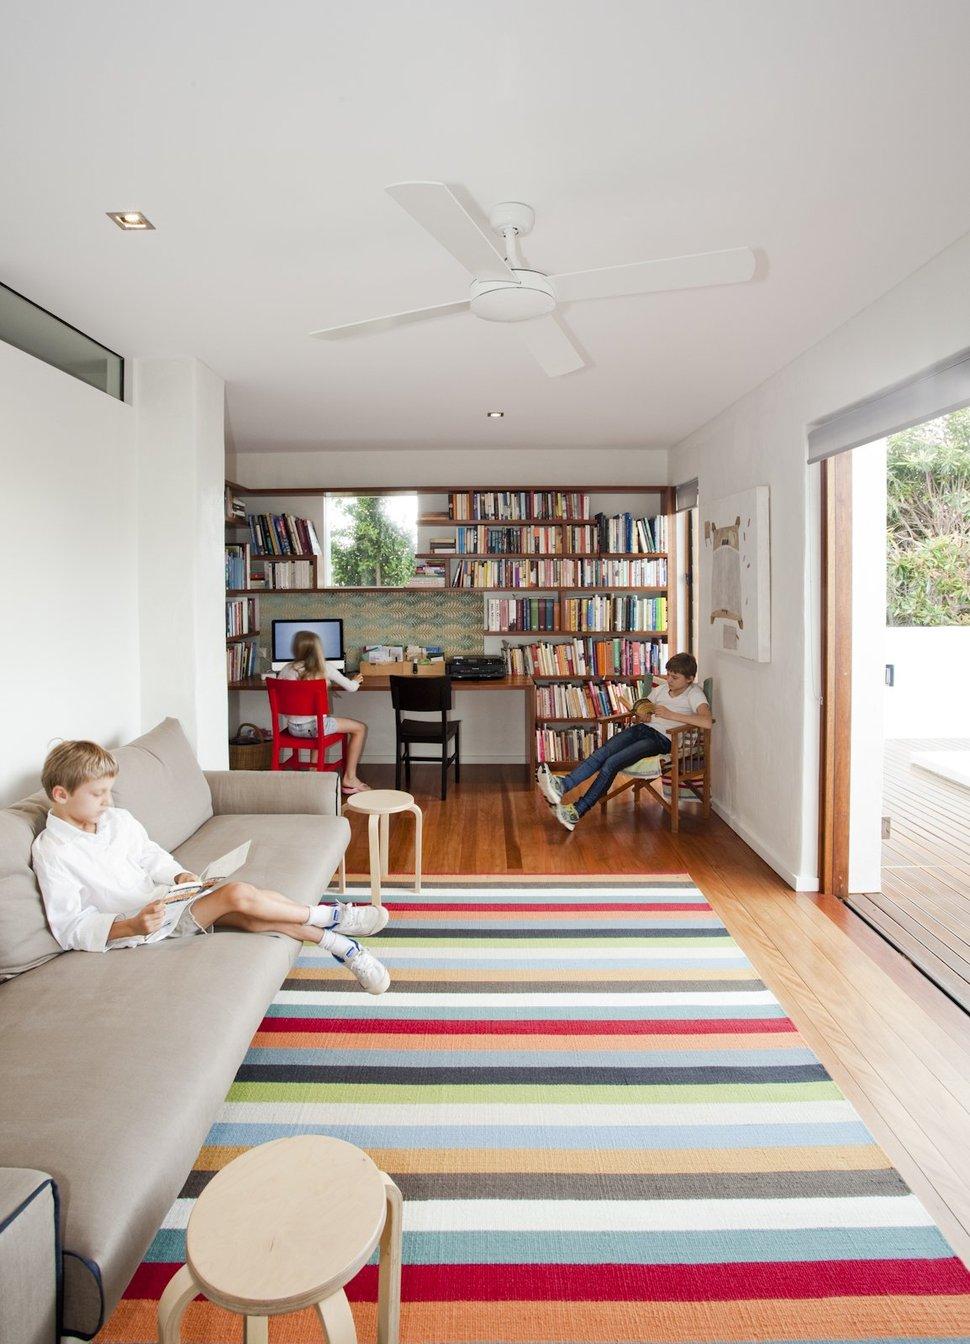 . Stunningly Reinvented Australian Home Features Towering Indoor